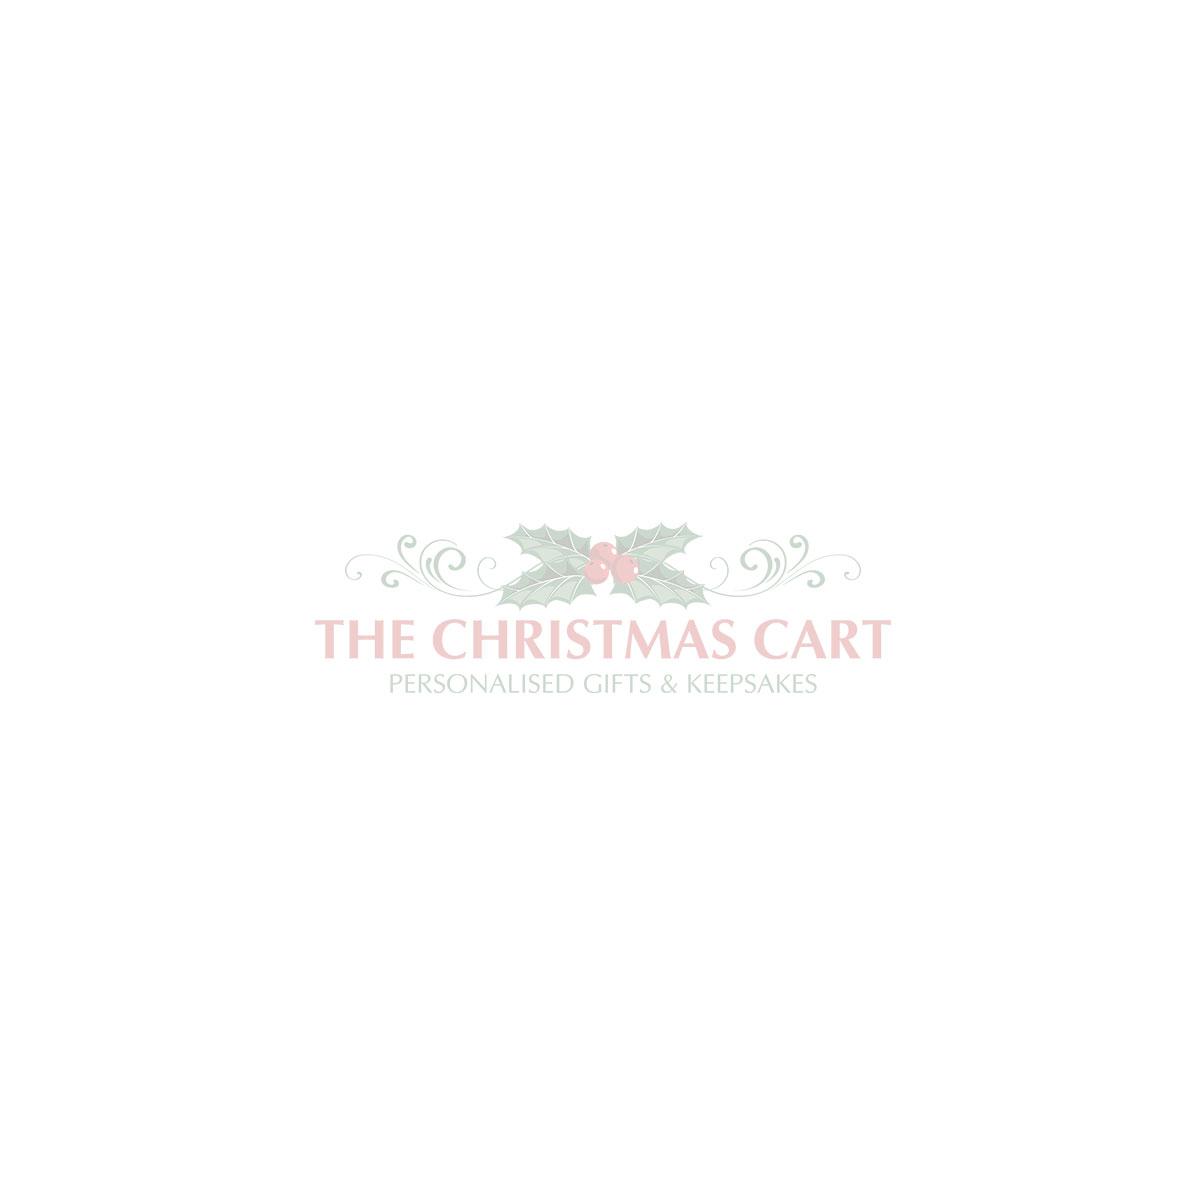 Standing Fabric Santa in Plaid Shirt Christmas Figurine Ornament